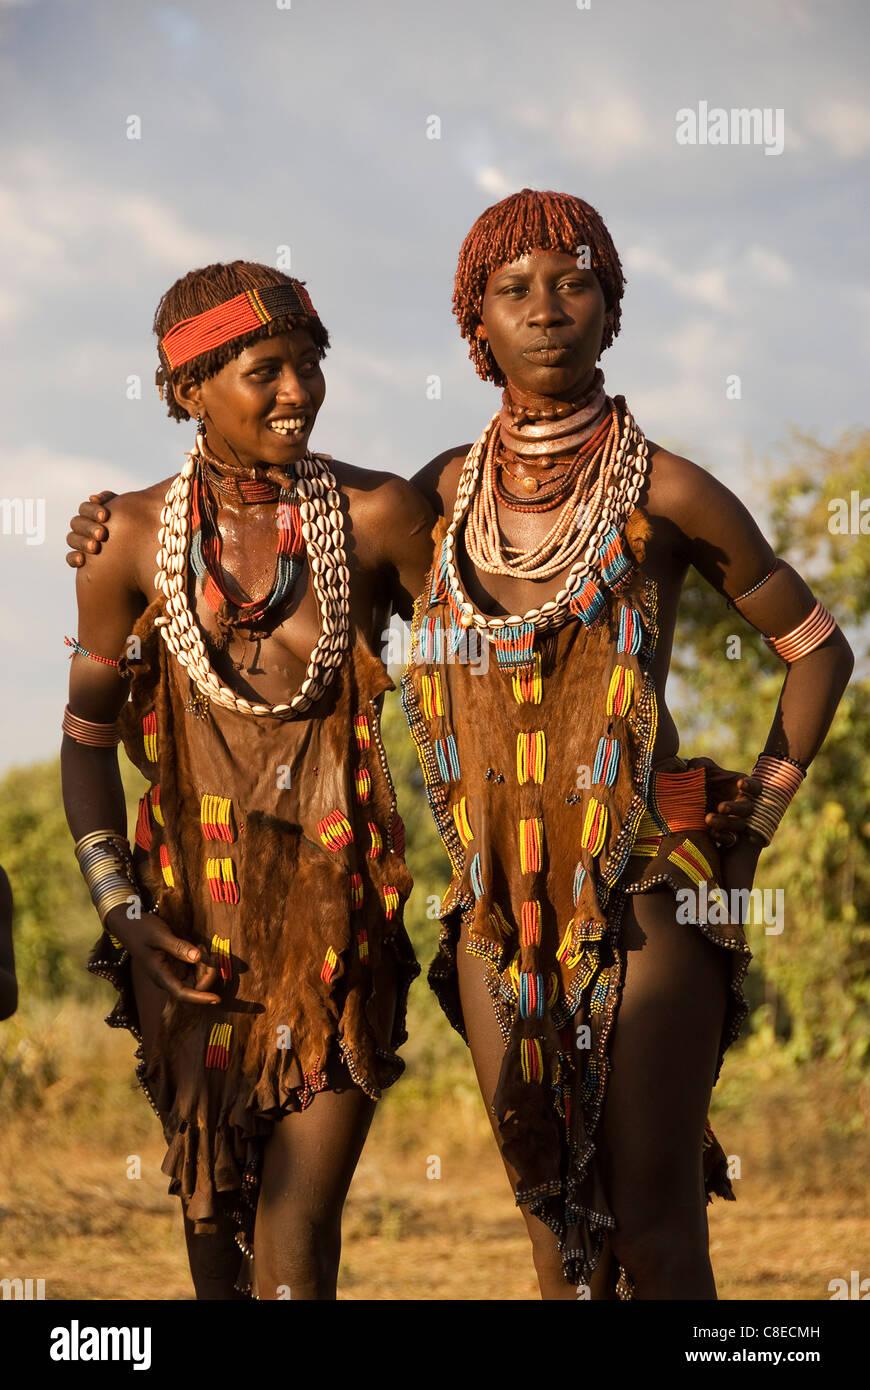 Elk200-5488v Ethiopia, Omo Valley, Hamer tribe, women dancers - Stock Image